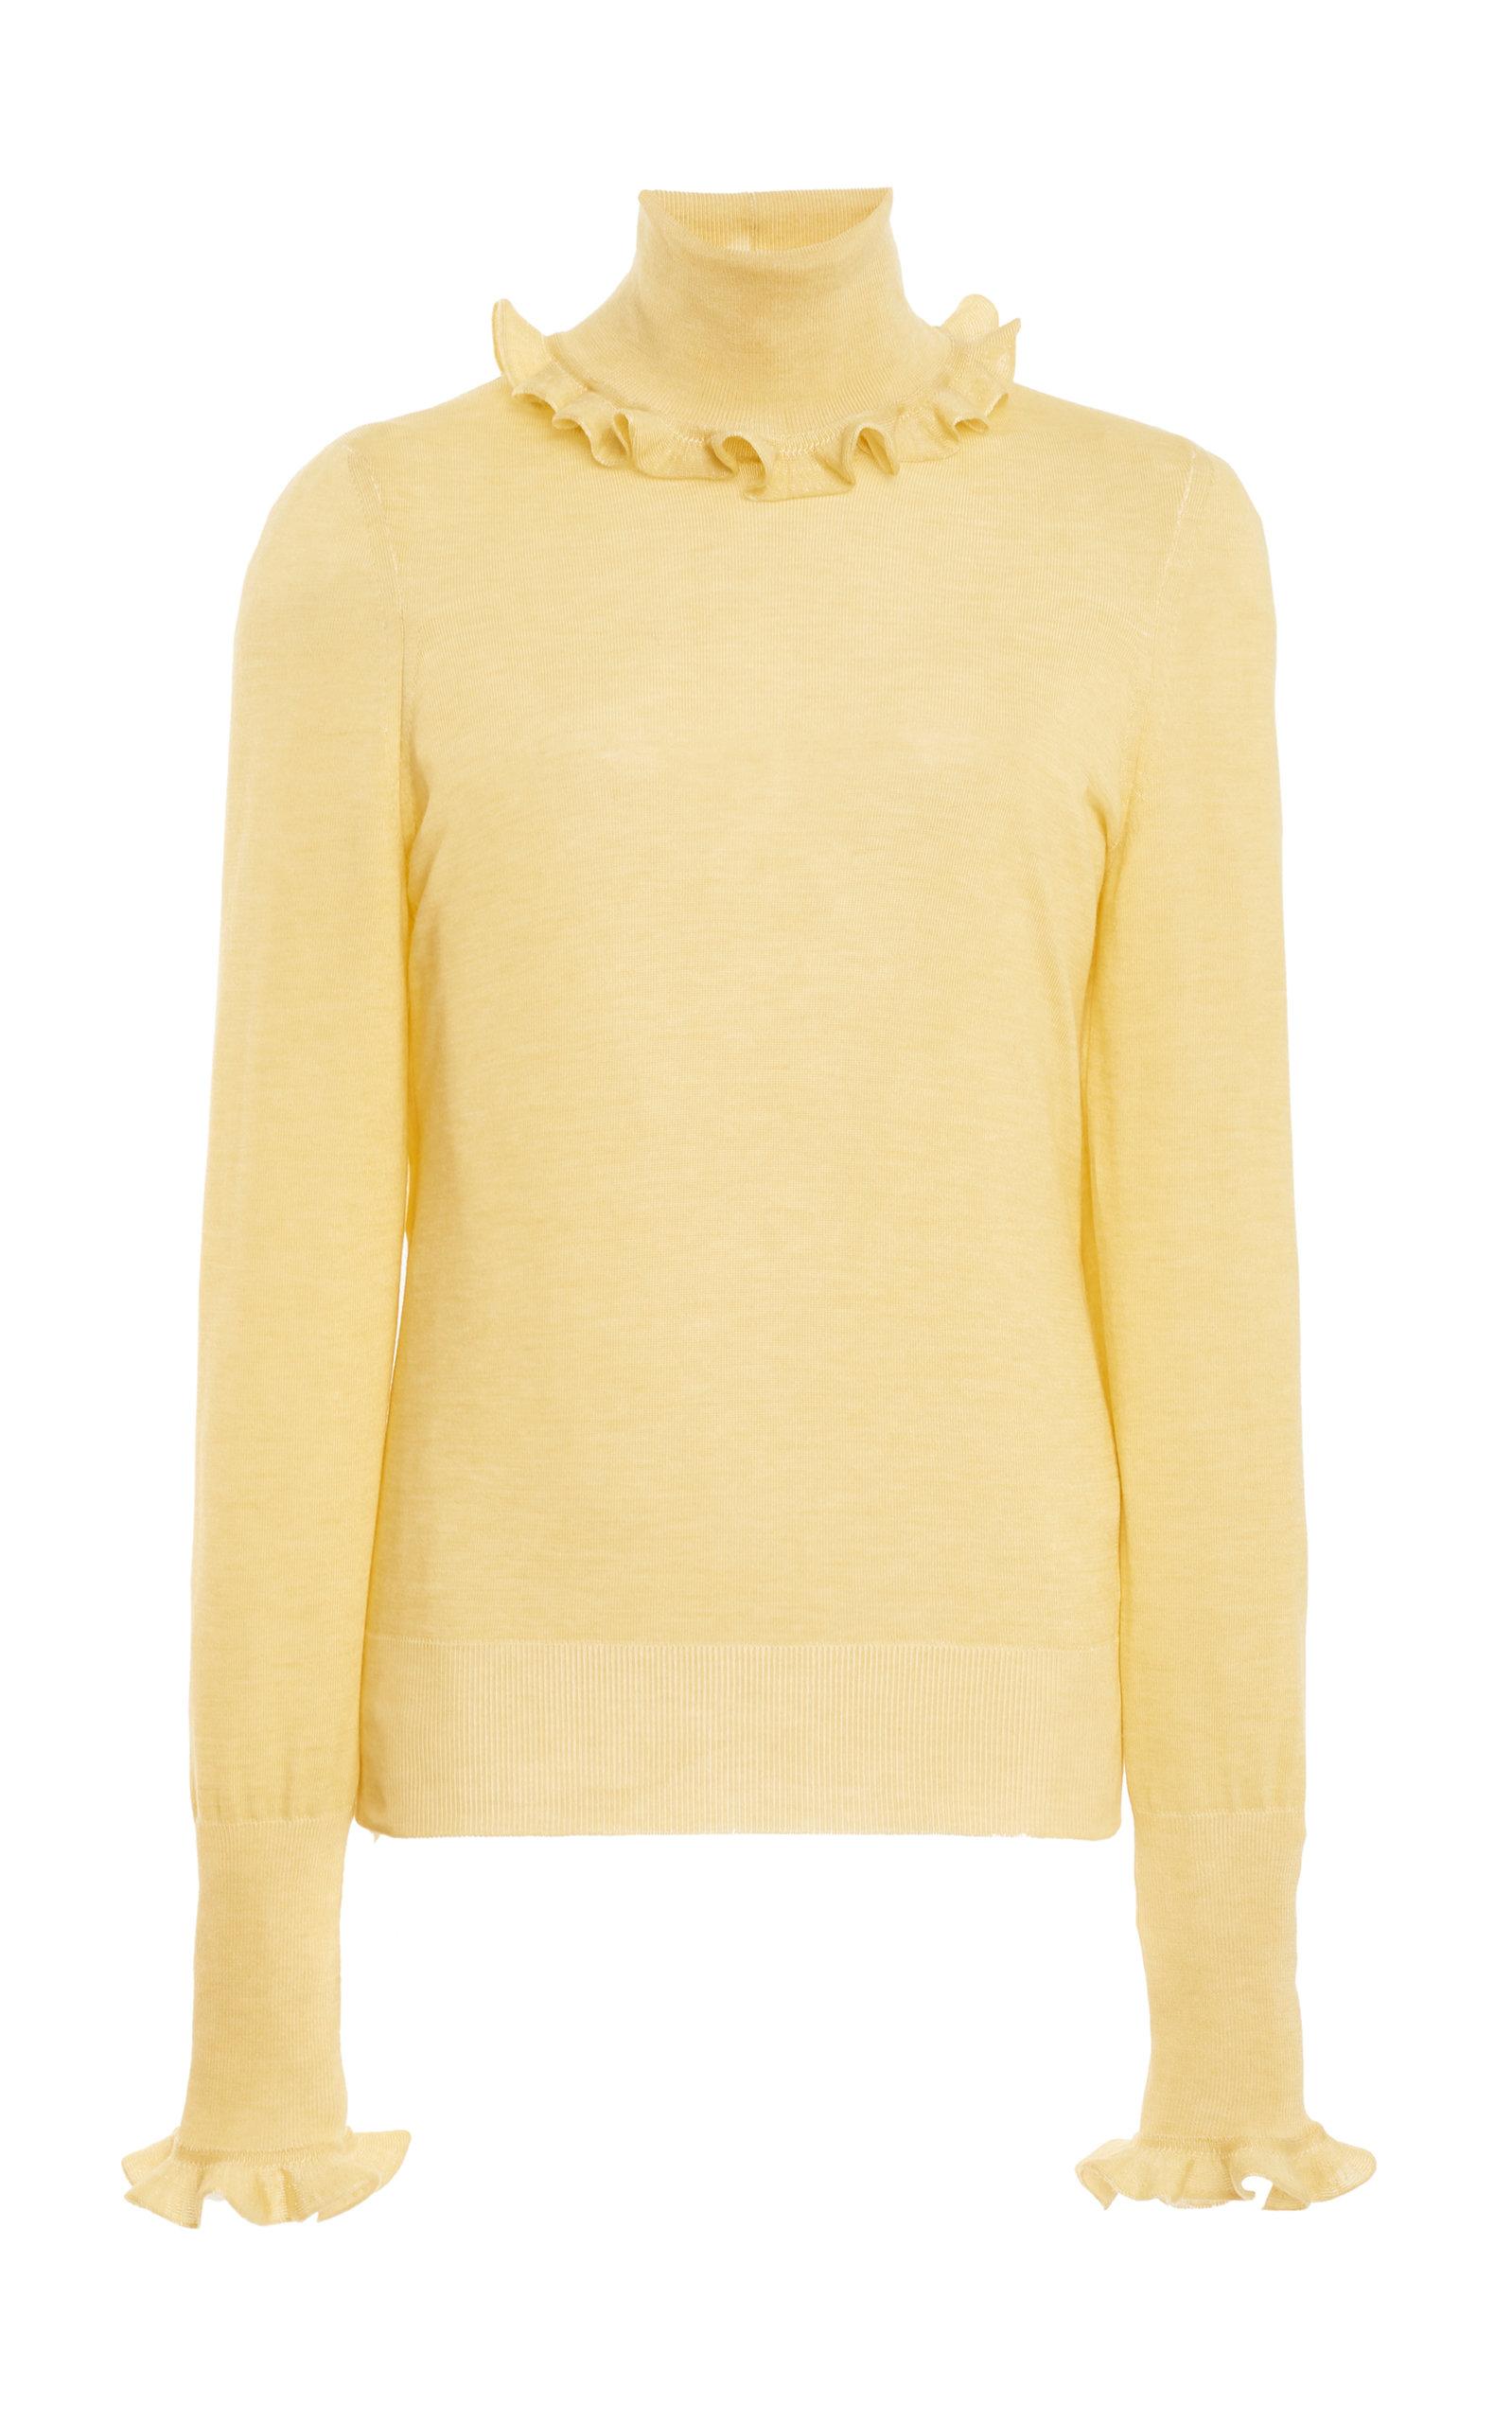 Victoria Beckham Frill Detail Polo Shirt In Neutral